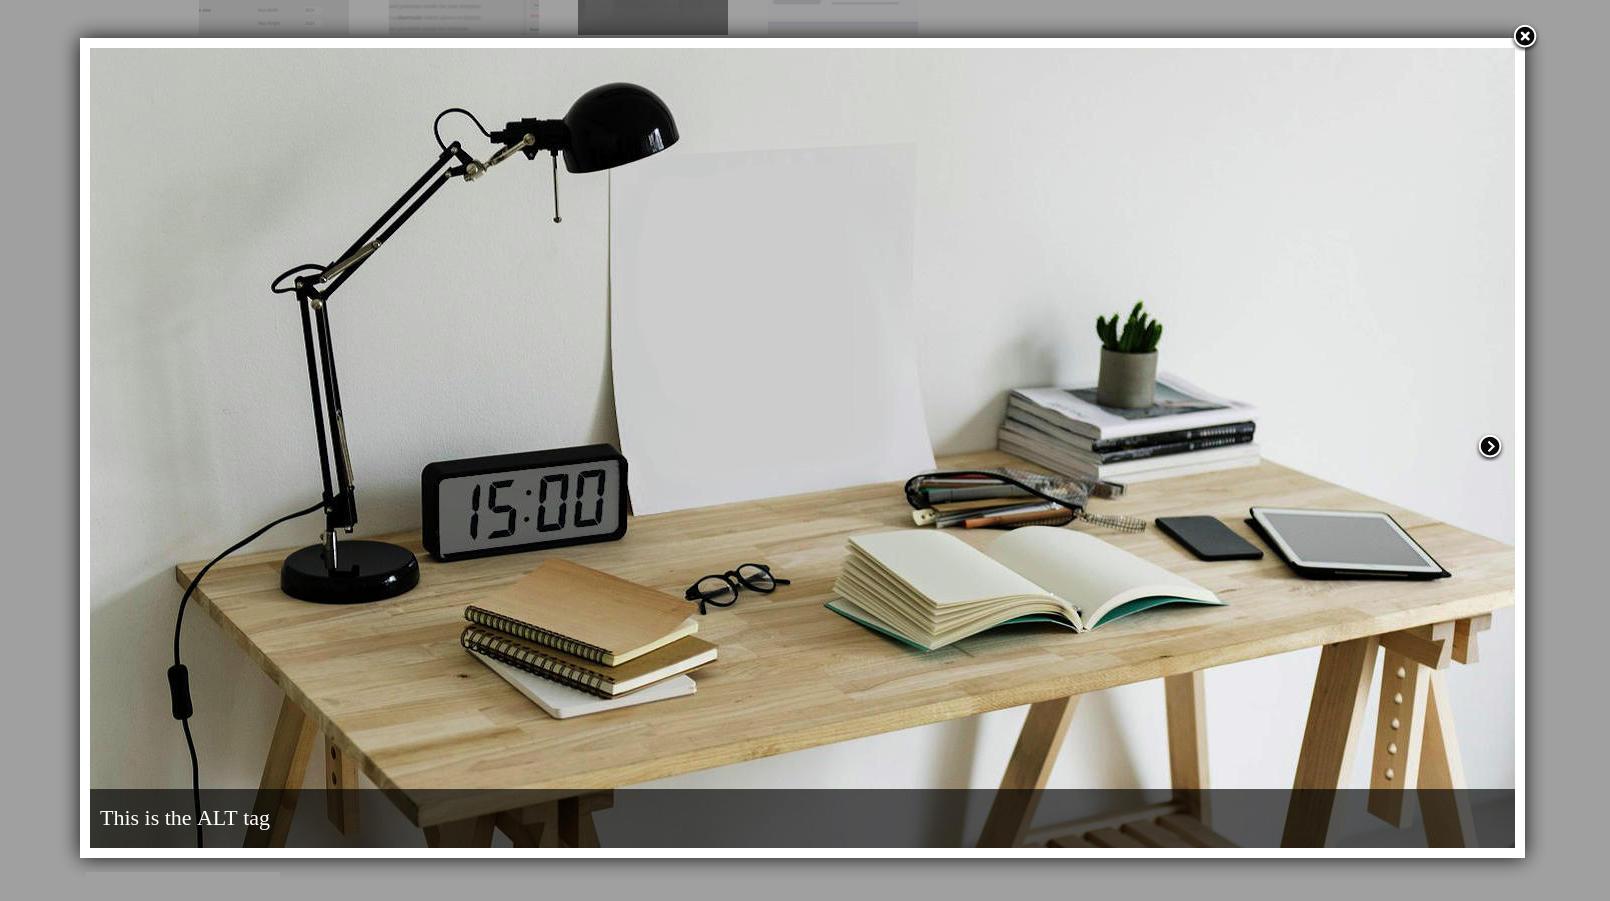 Free WordPress Lightbox plugins - FancyBox